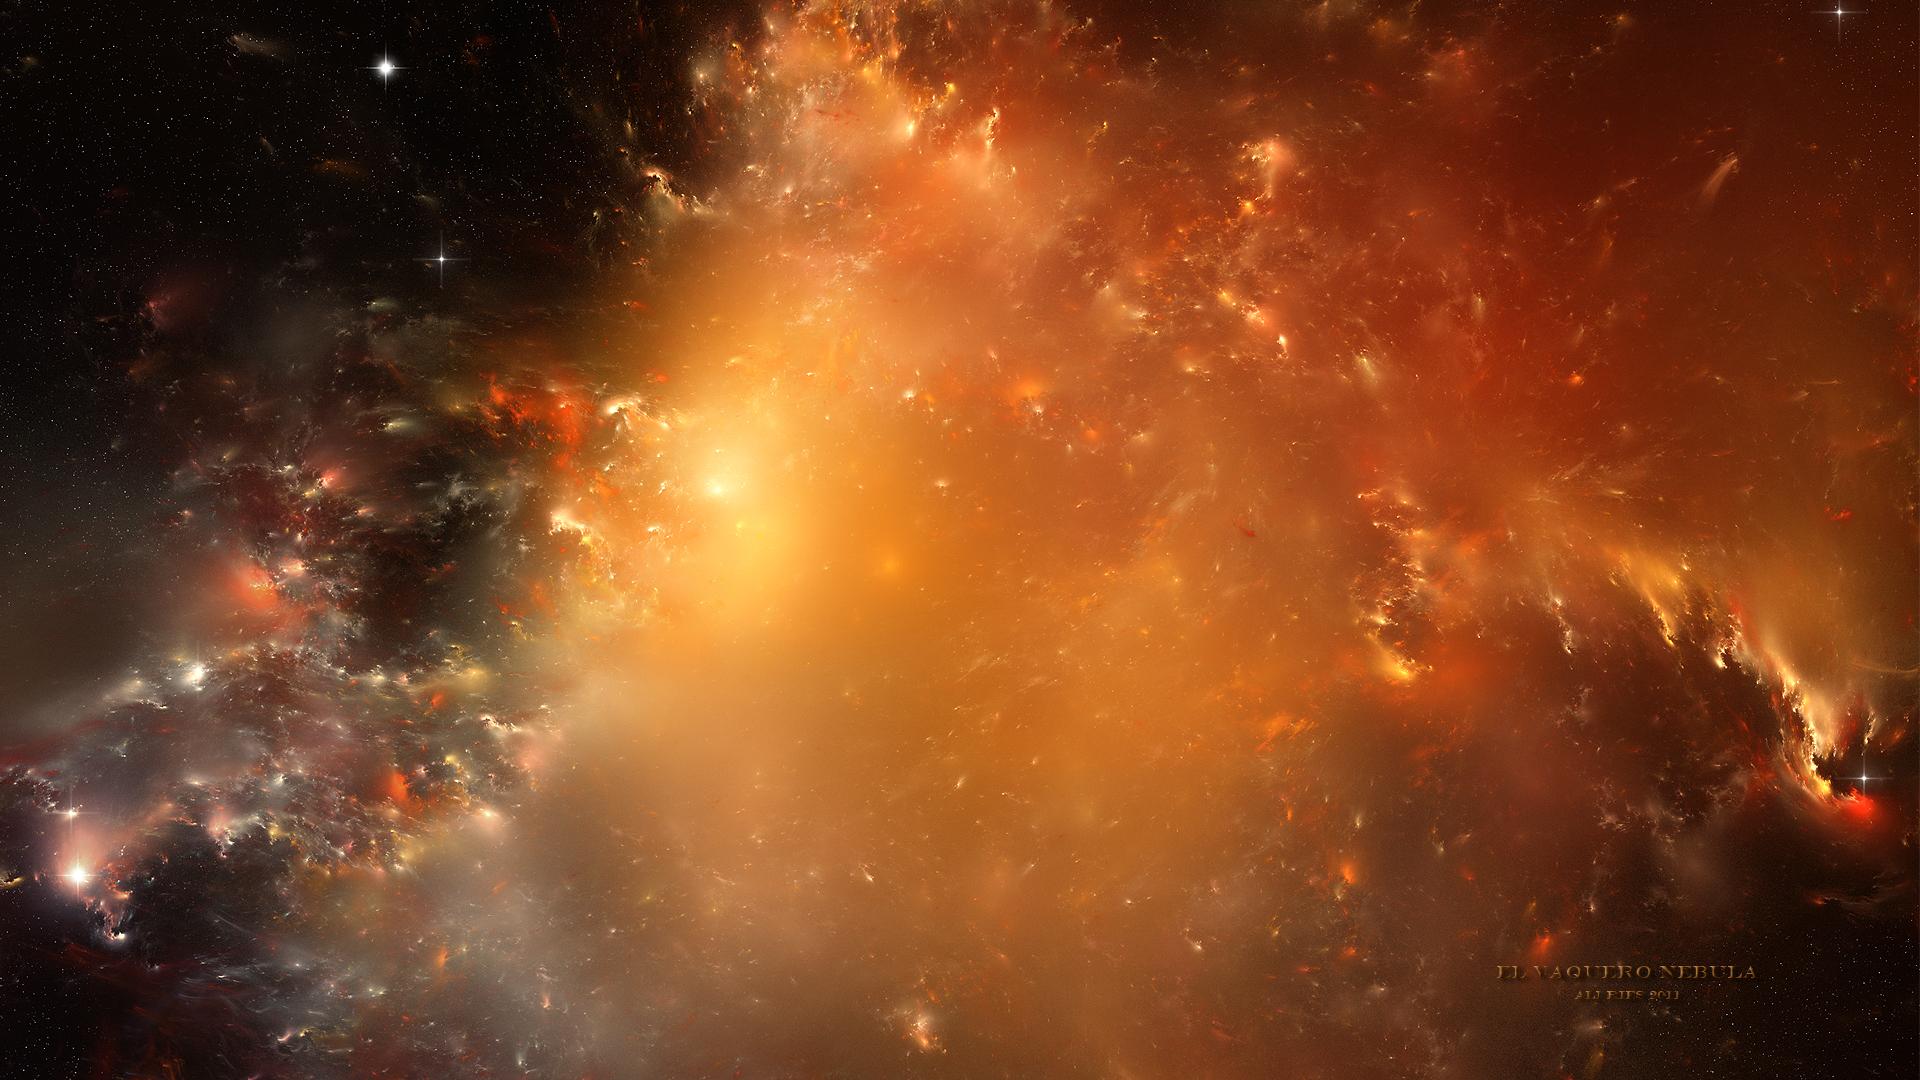 Fantascienza - Nebula  Sfondo